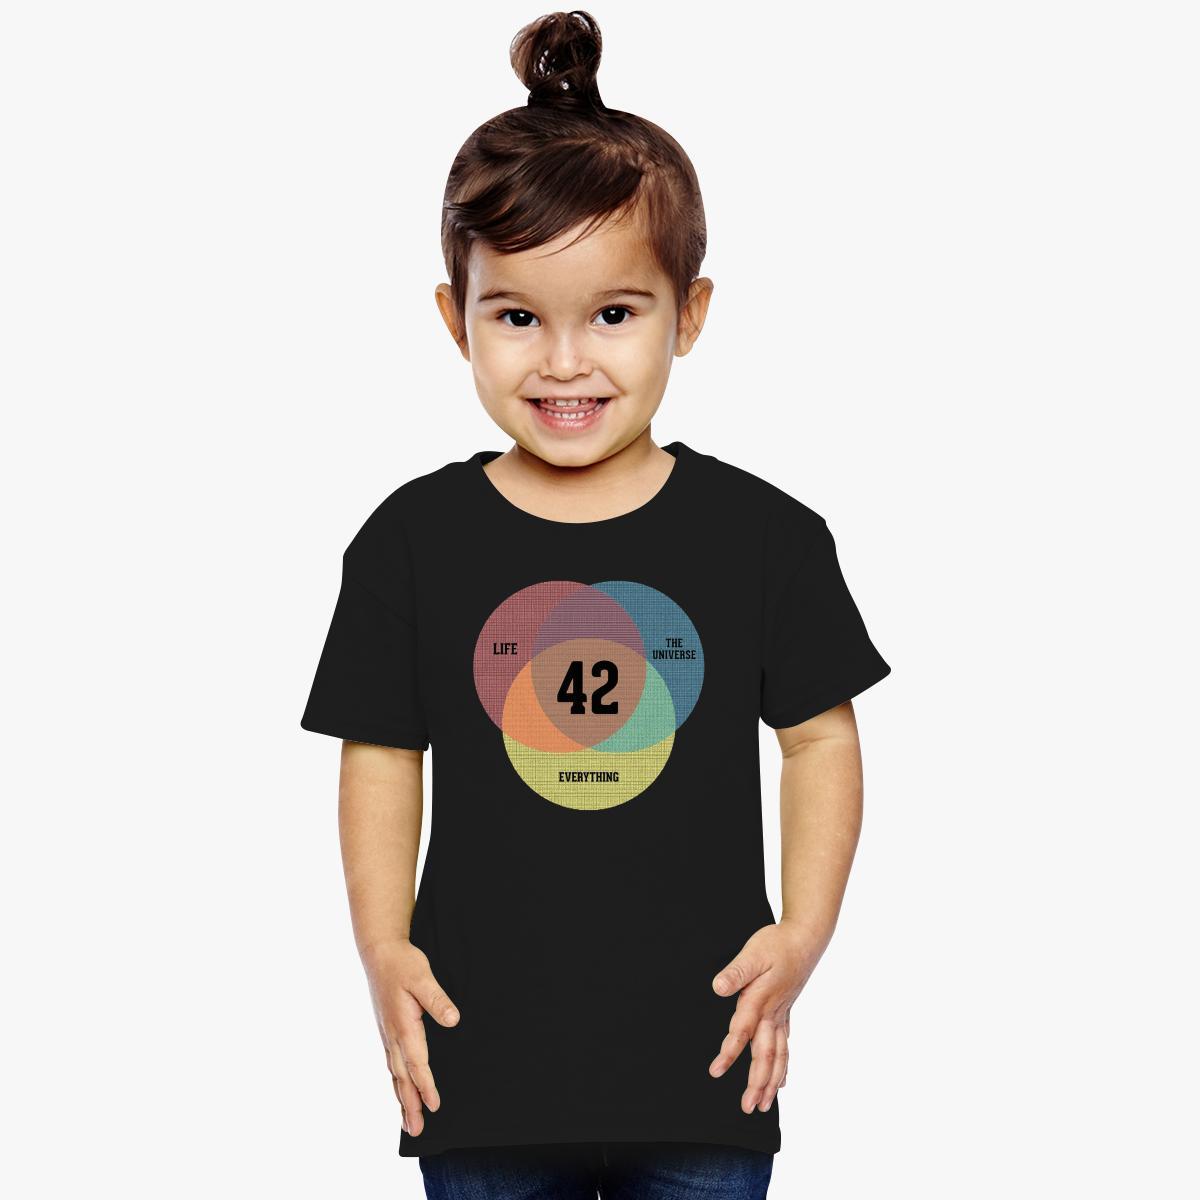 Venn diagram life the universe toddler t shirt customon venn diagram life the universe toddler t shirt pooptronica